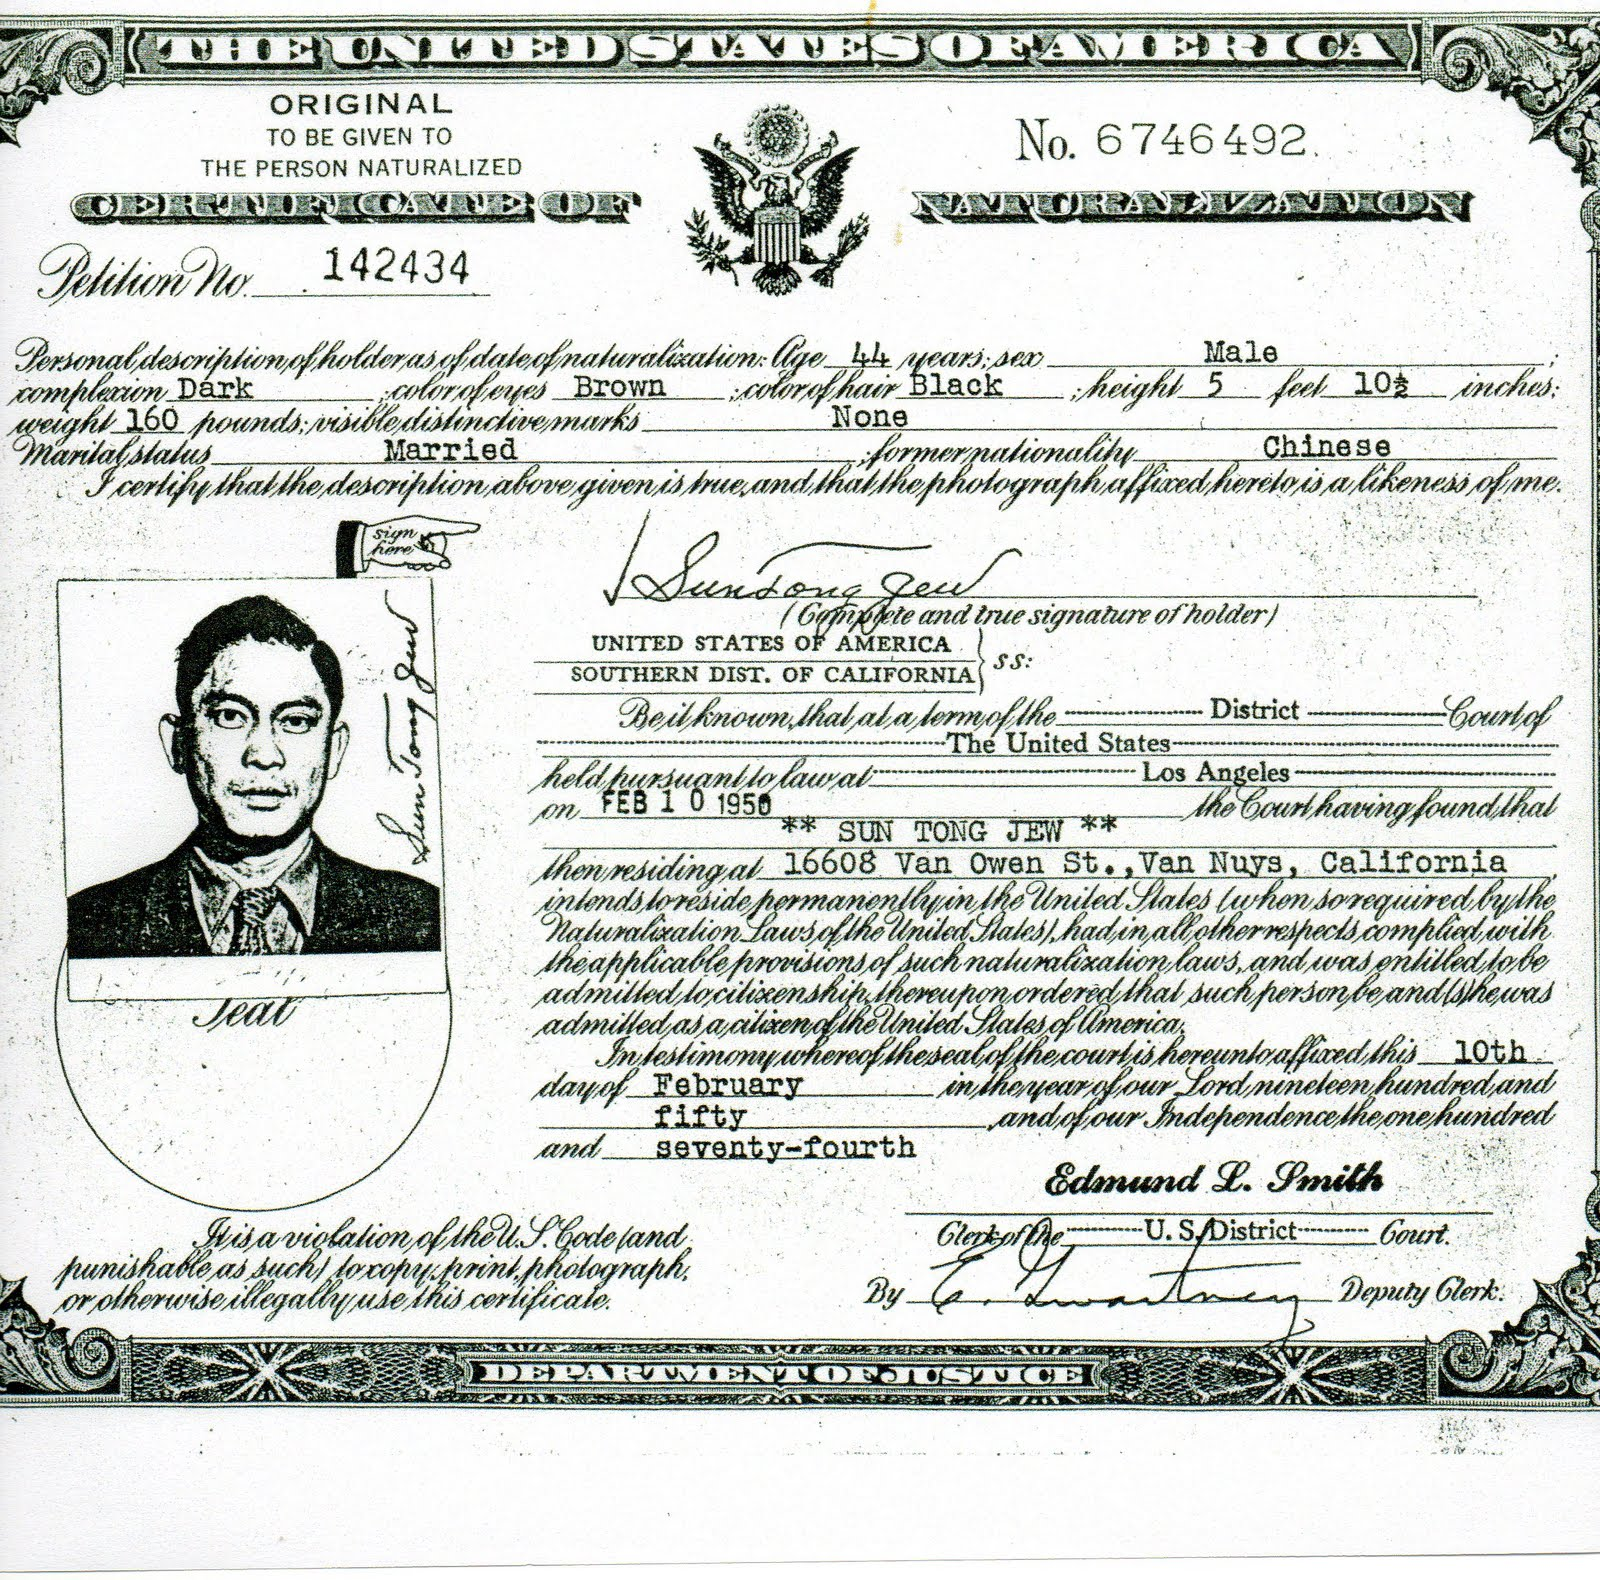 Jue Joe Clan History: Details: Sun Tong Jew Naturalization Certificate